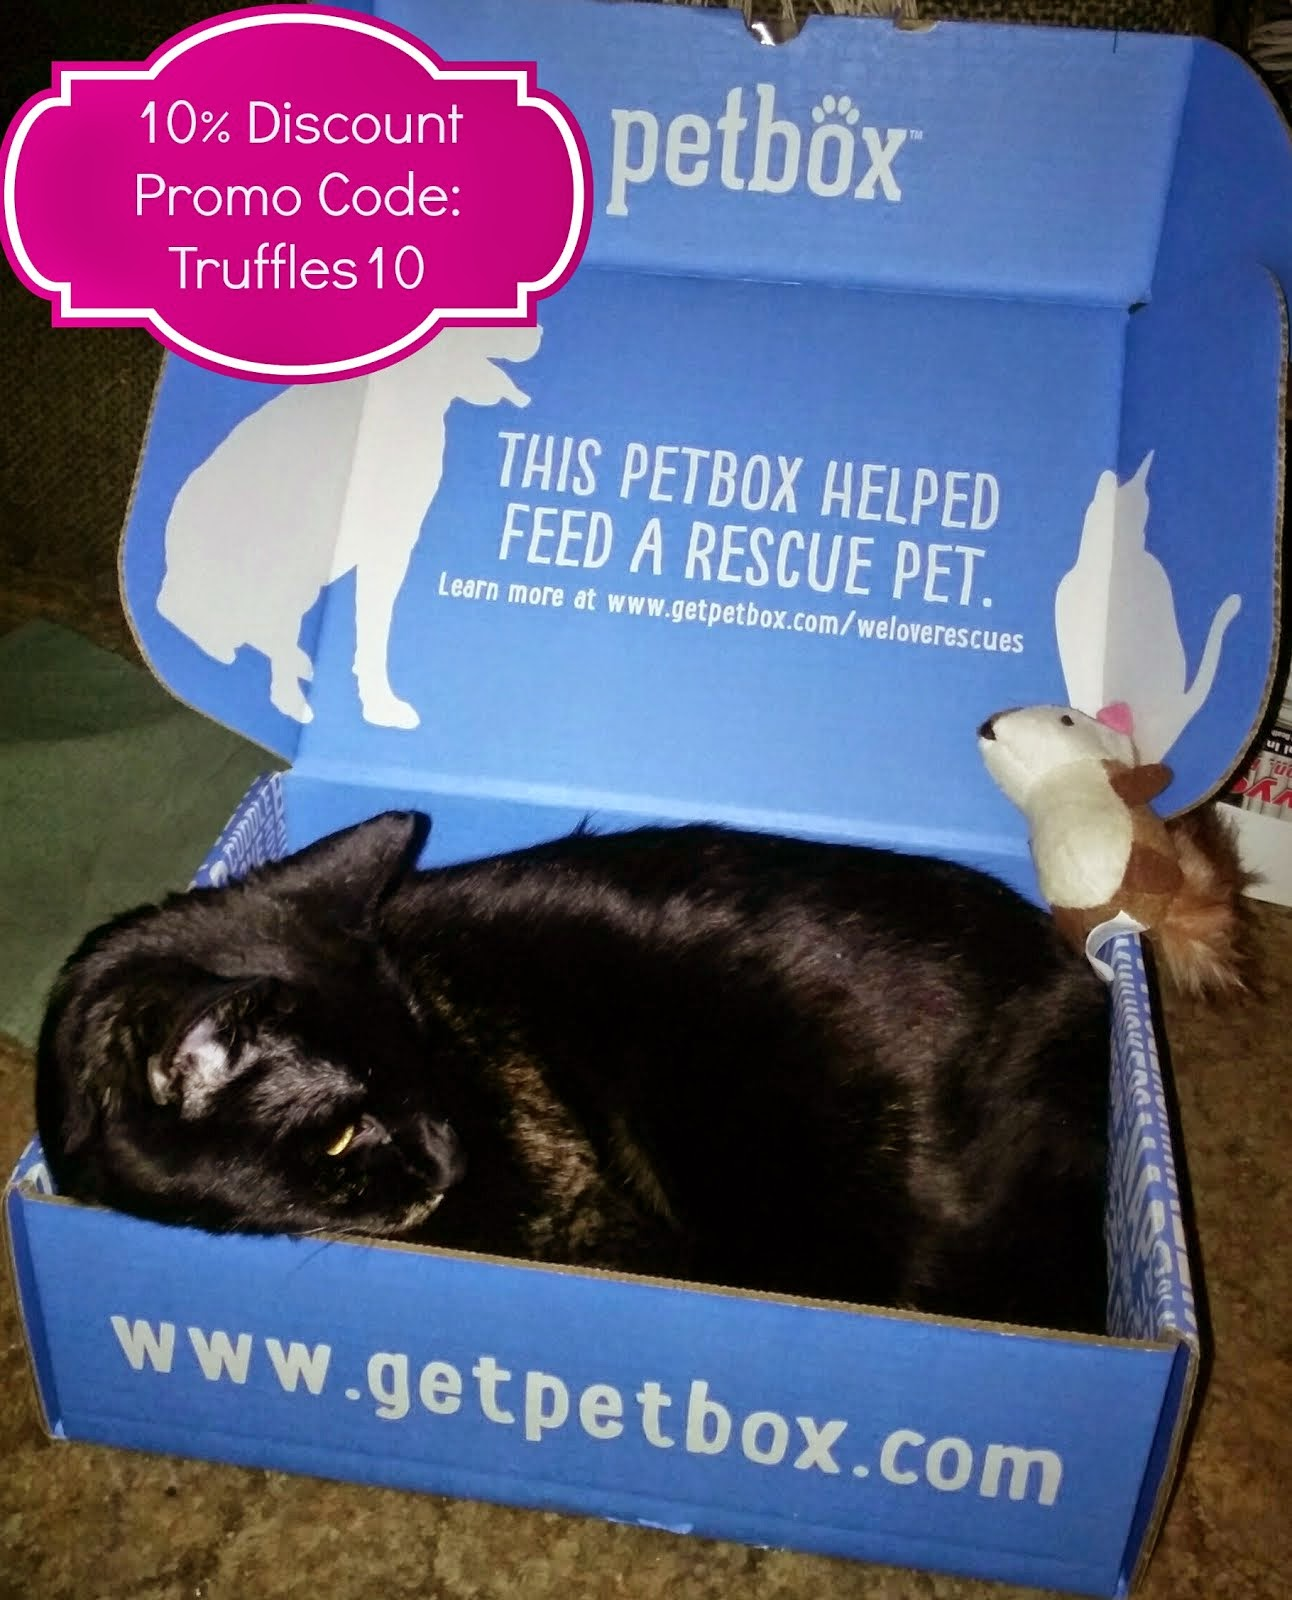 PetBox Brand Ambassador